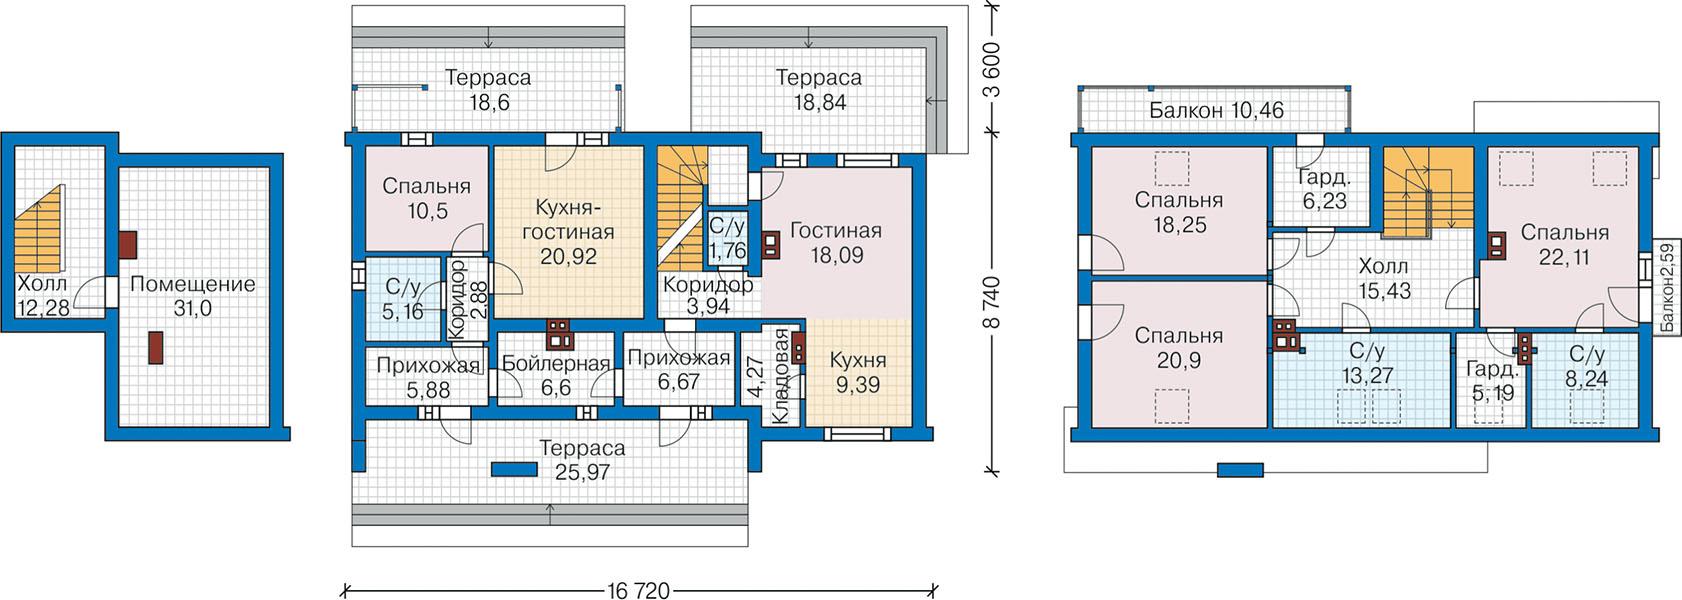 План первого этажа - проект Ларвик